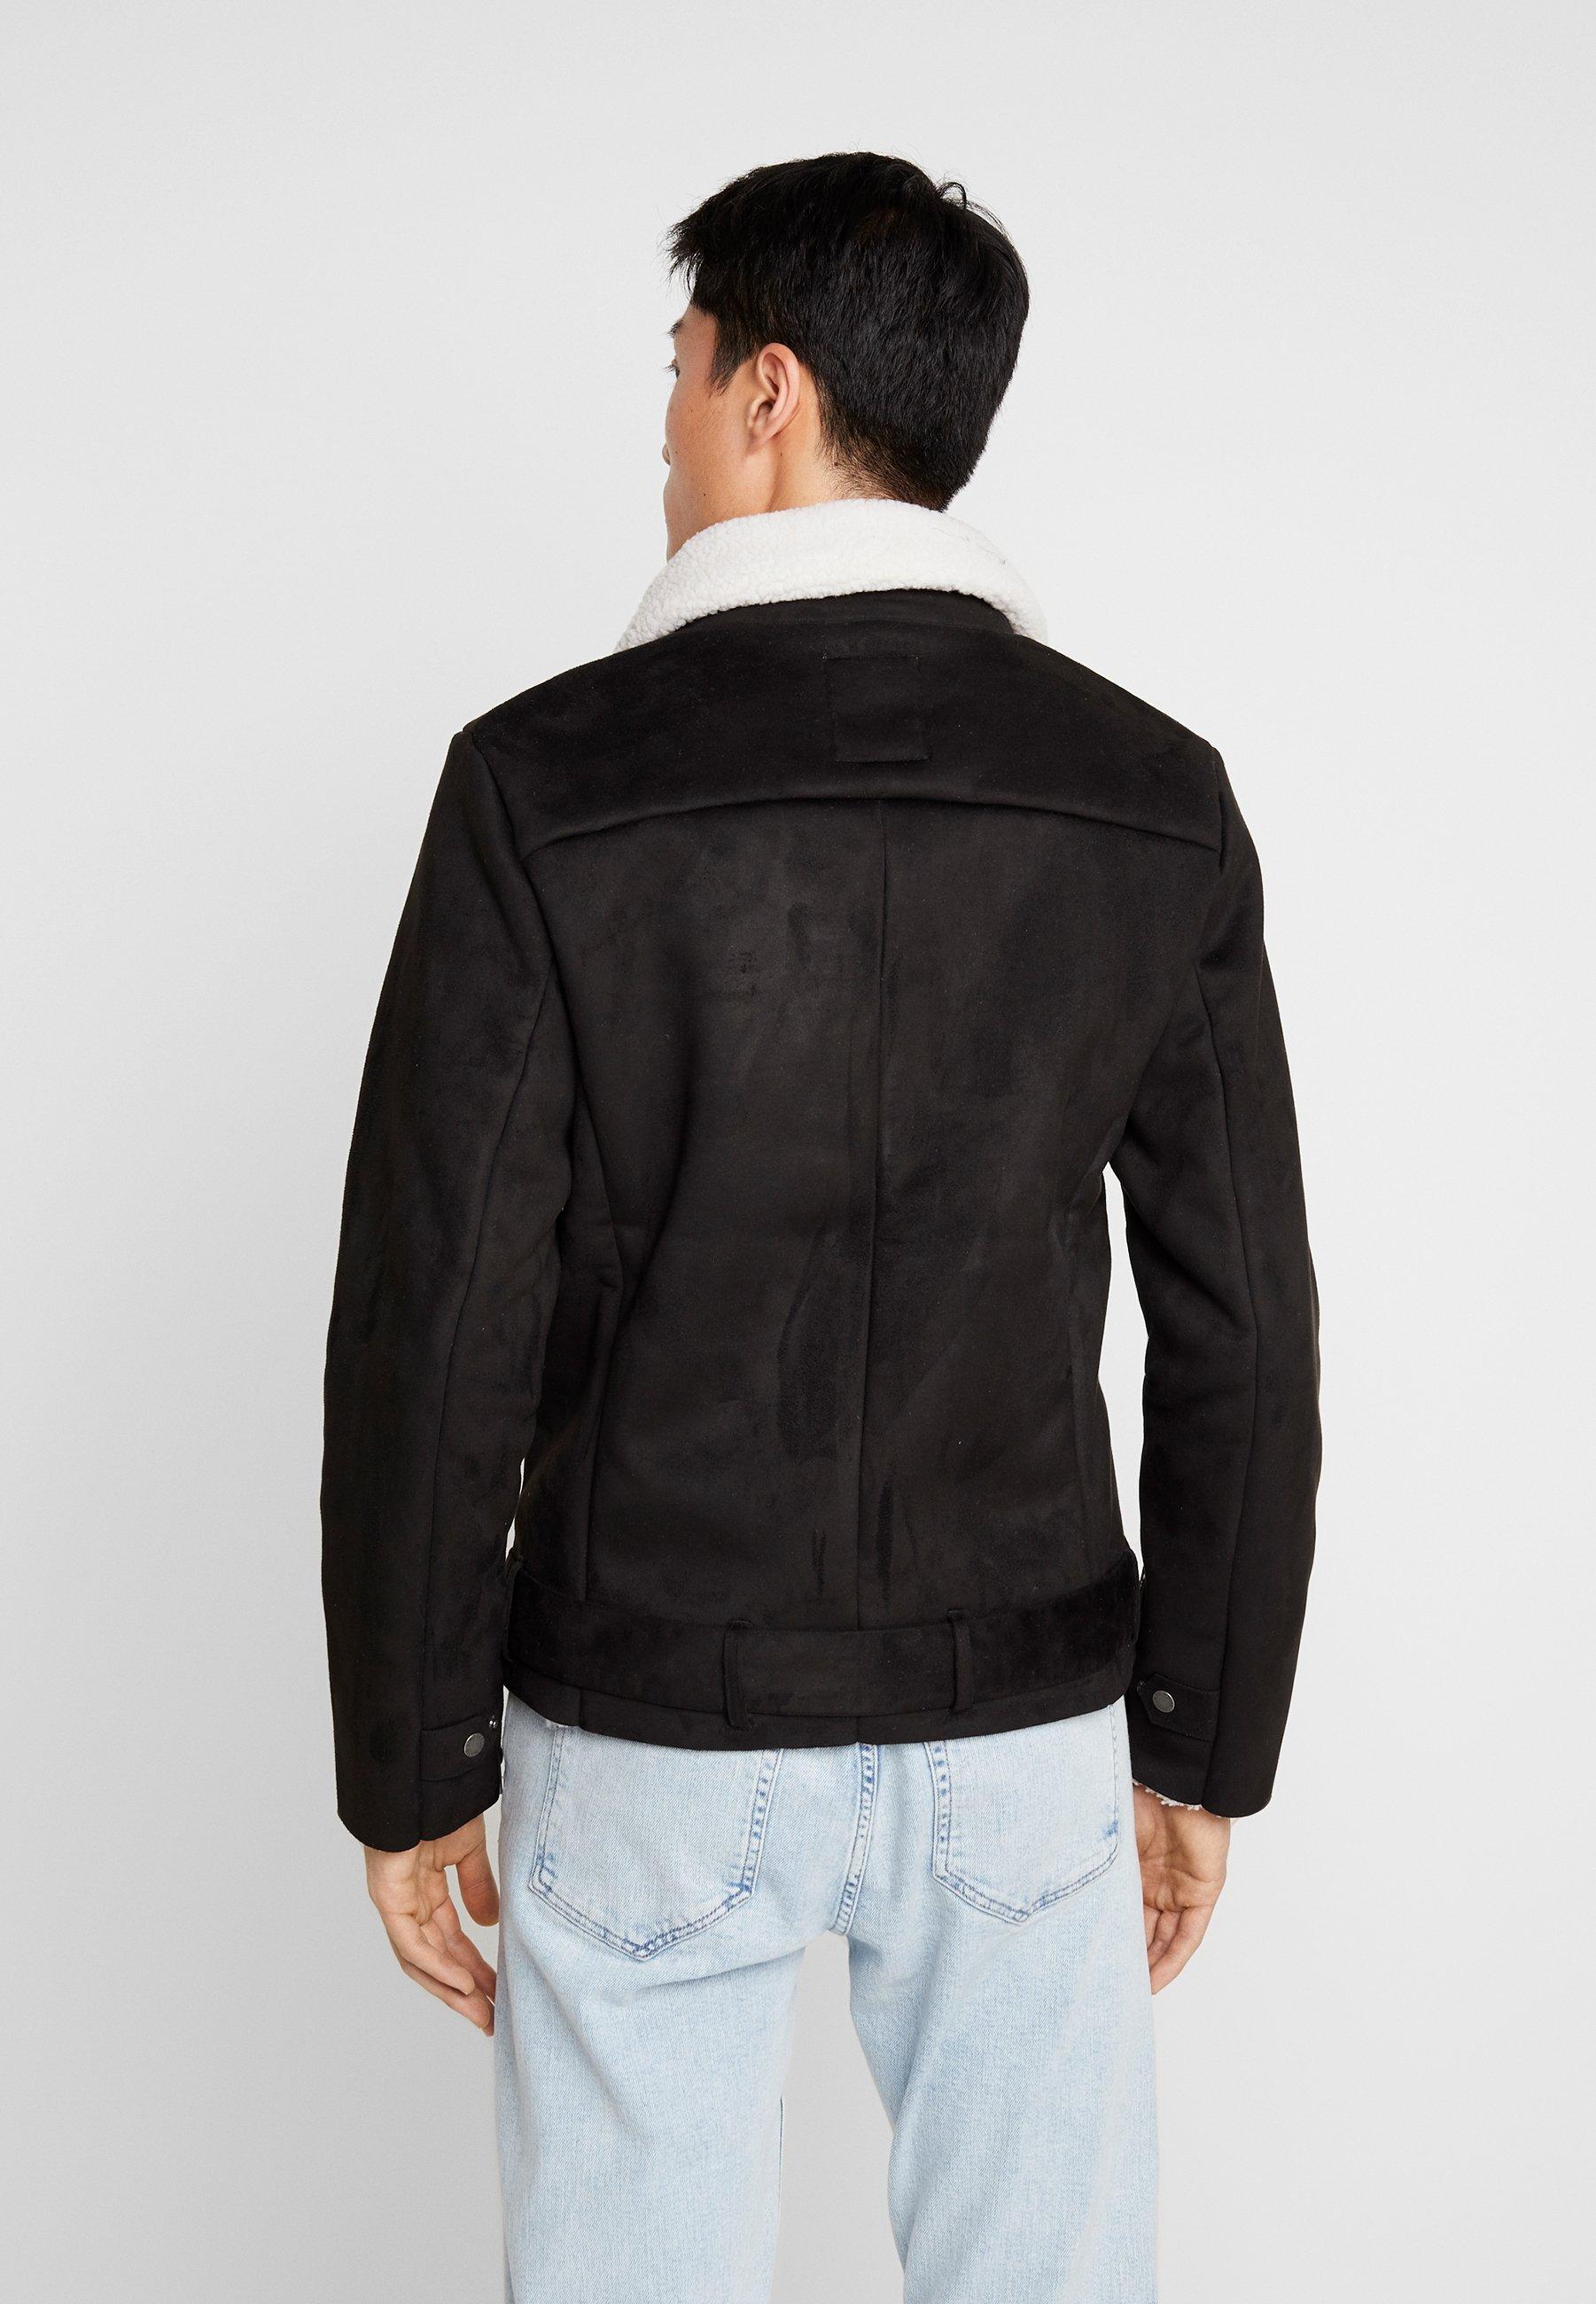 Burton Menswear London Herr BLACK BIKER svart Jacka i